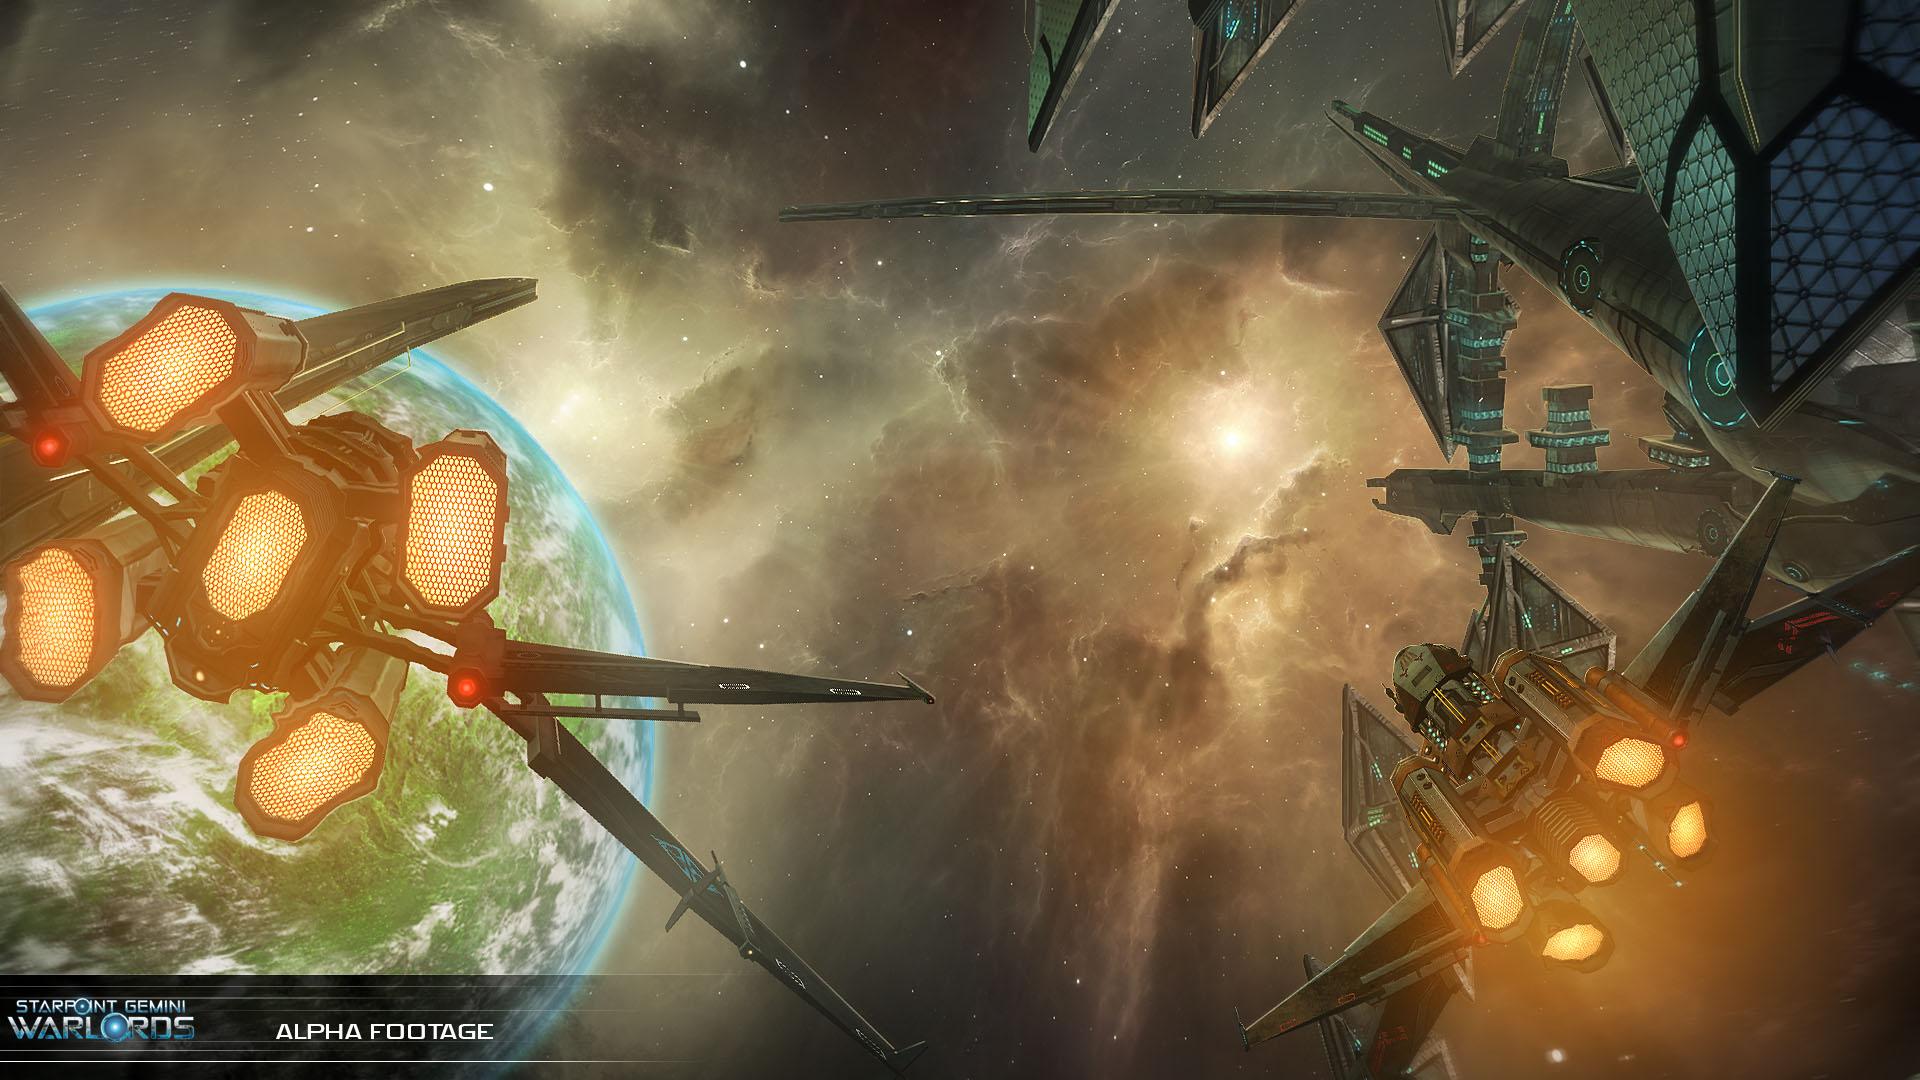 StarpointGemini Warlords 02